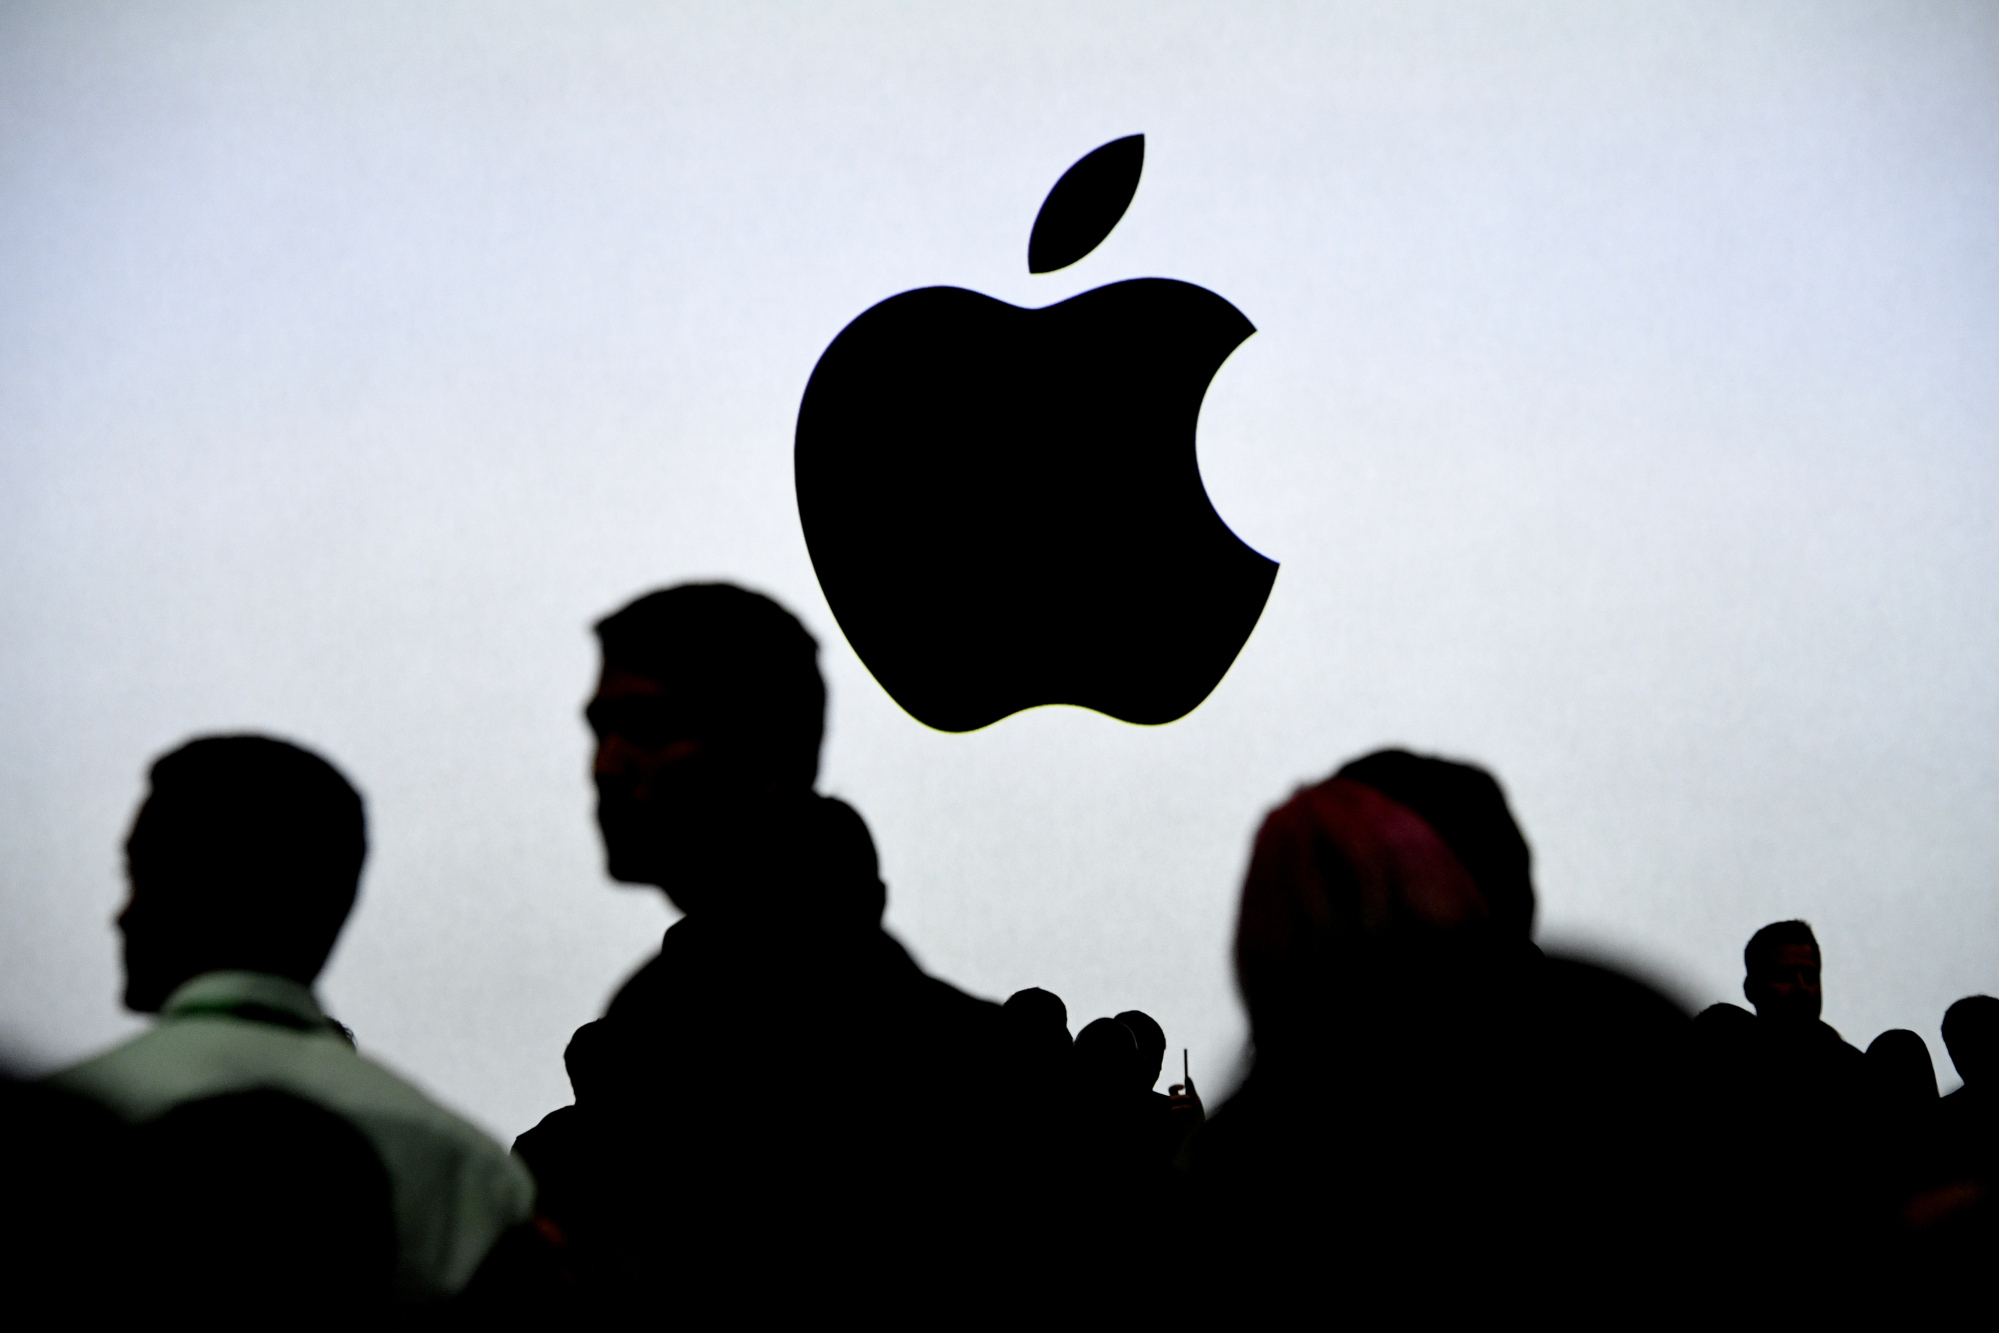 Aaplnasdaq gs stock quote apple inc bloomberg markets buycottarizona